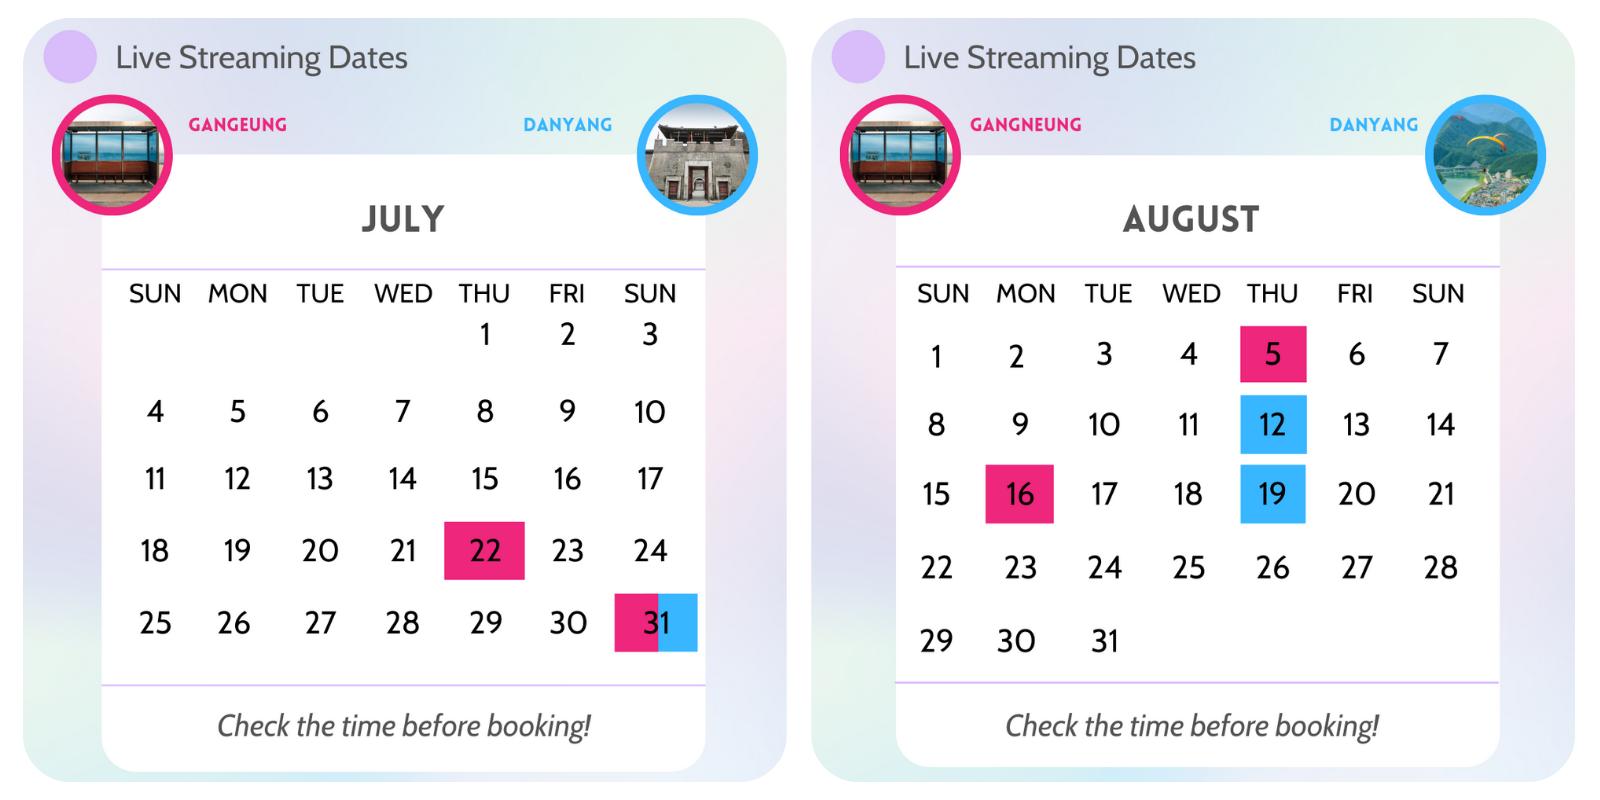 Gangneung & Danyang July / August